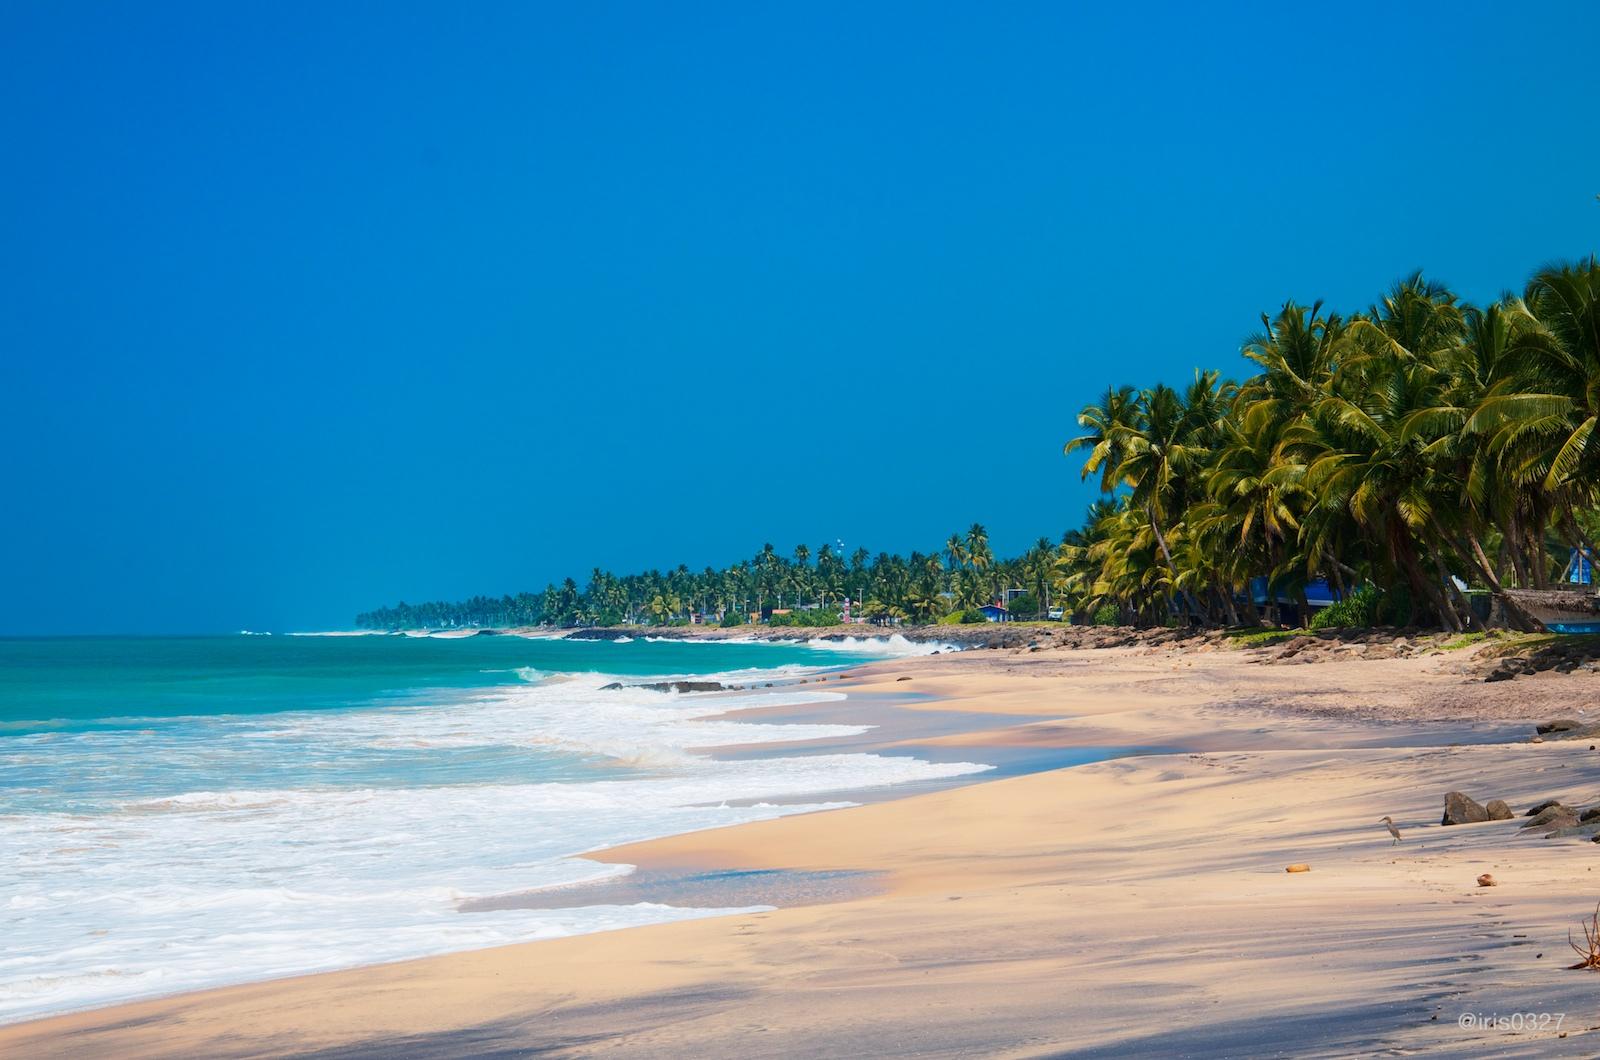 Hikkaduwa Sri Lanka  city photos gallery : Sri Lanka 2016: en busca del exotismo en Ceilán Blog de viajes a ...